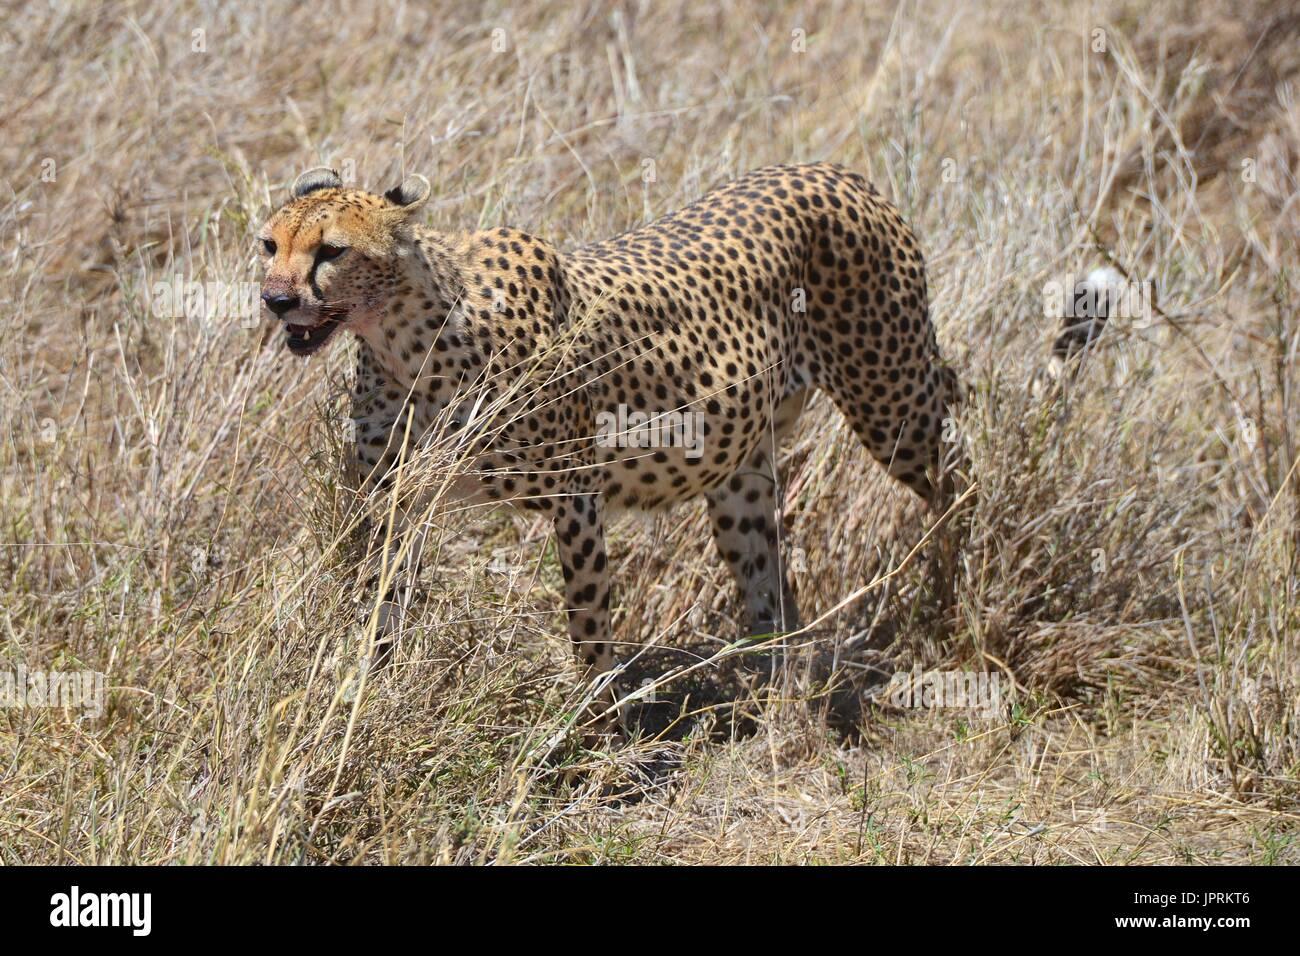 Cheetah roaming the savanna in the Serengeti National Park of Tanzania, Africa. Stock Photo